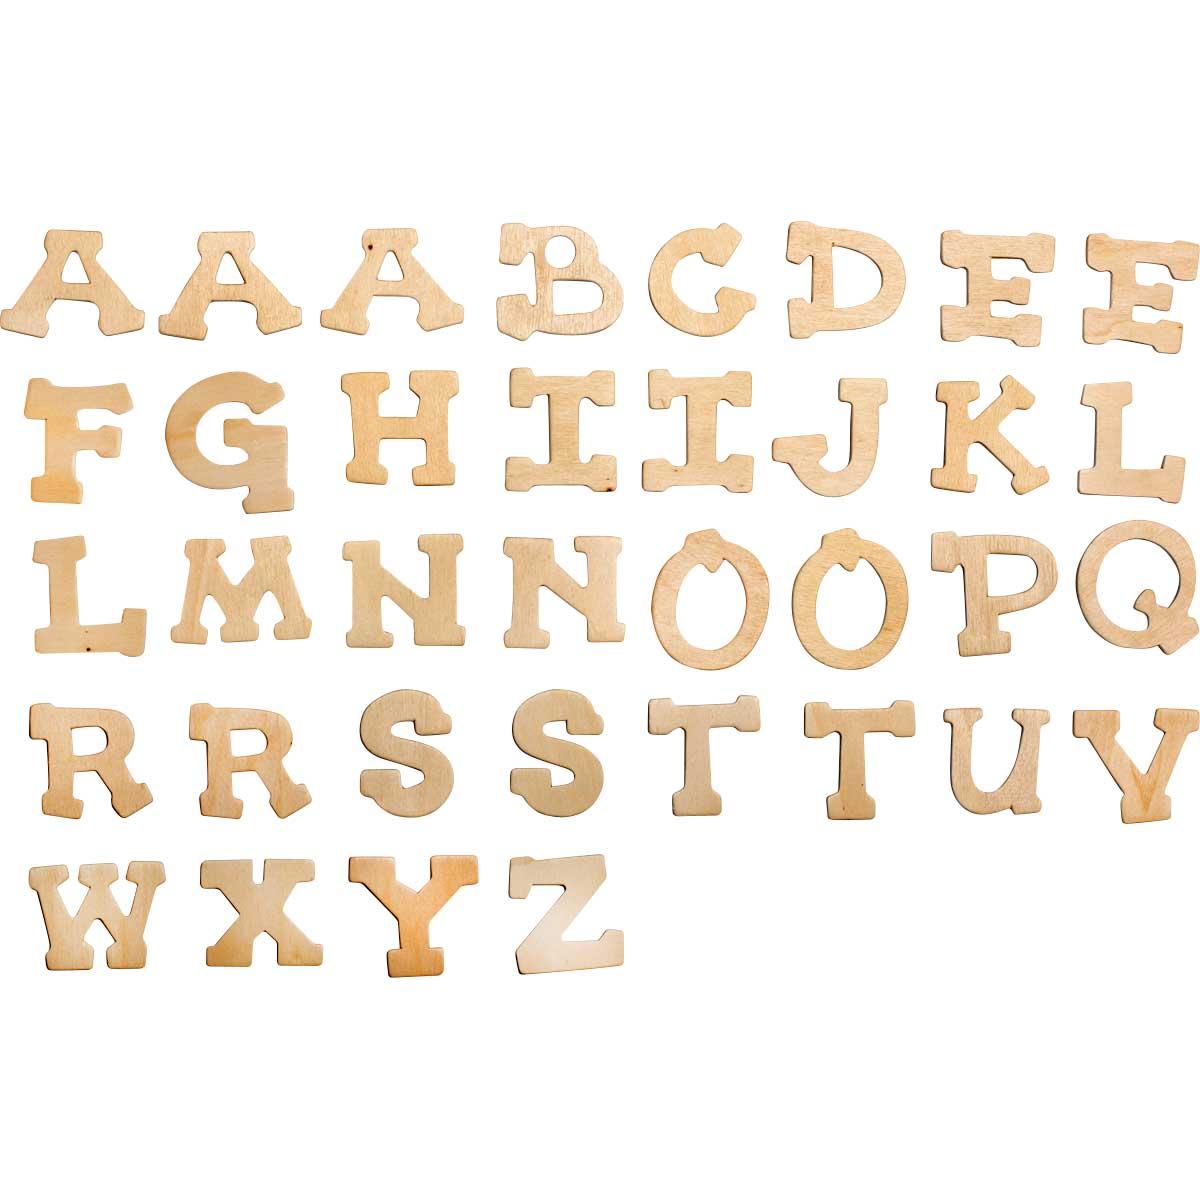 Plaid ® Wood Surfaces - Letter Packs - Fun Font